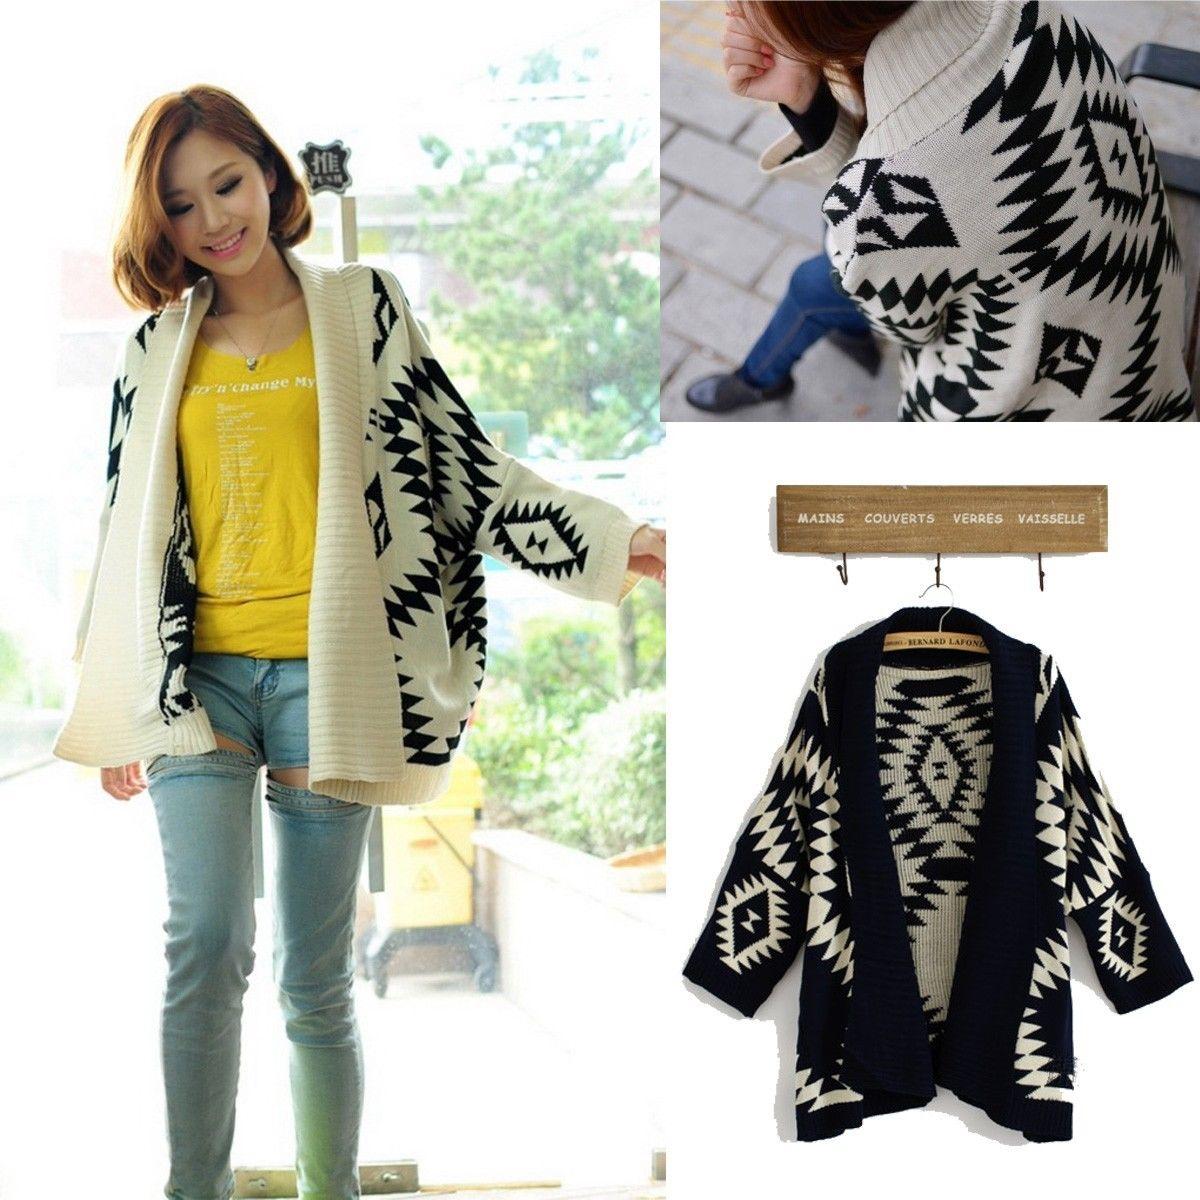 damen aztec open front wrap cape sweater strickjacke oversized cardigan jacke ebay. Black Bedroom Furniture Sets. Home Design Ideas